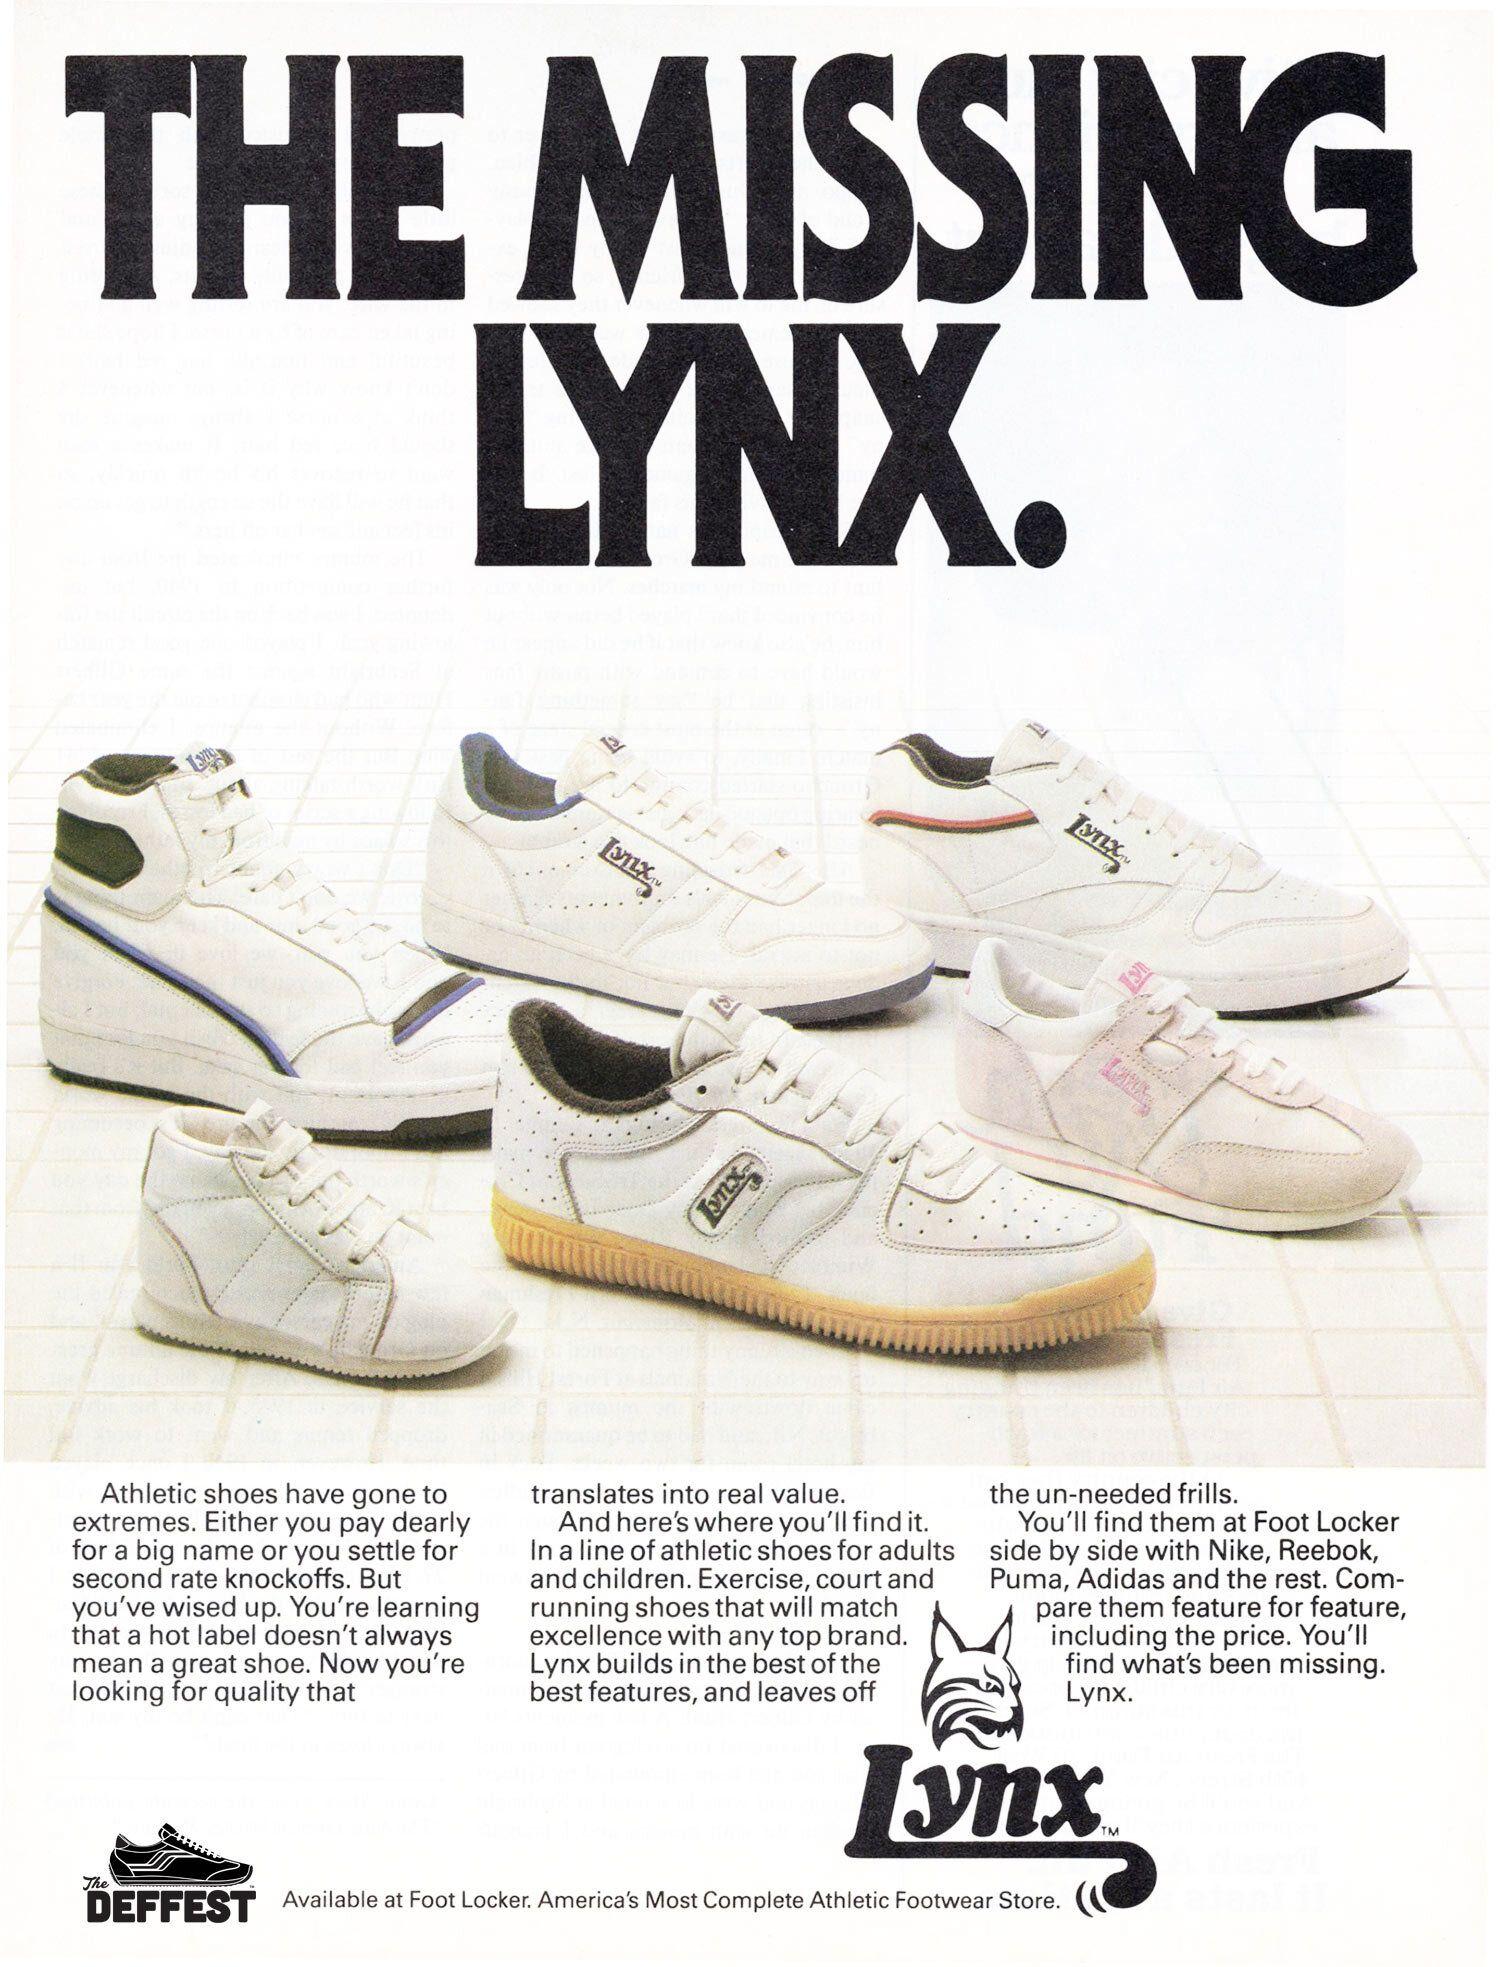 Foot Locker Lynx vintage sneaker ad